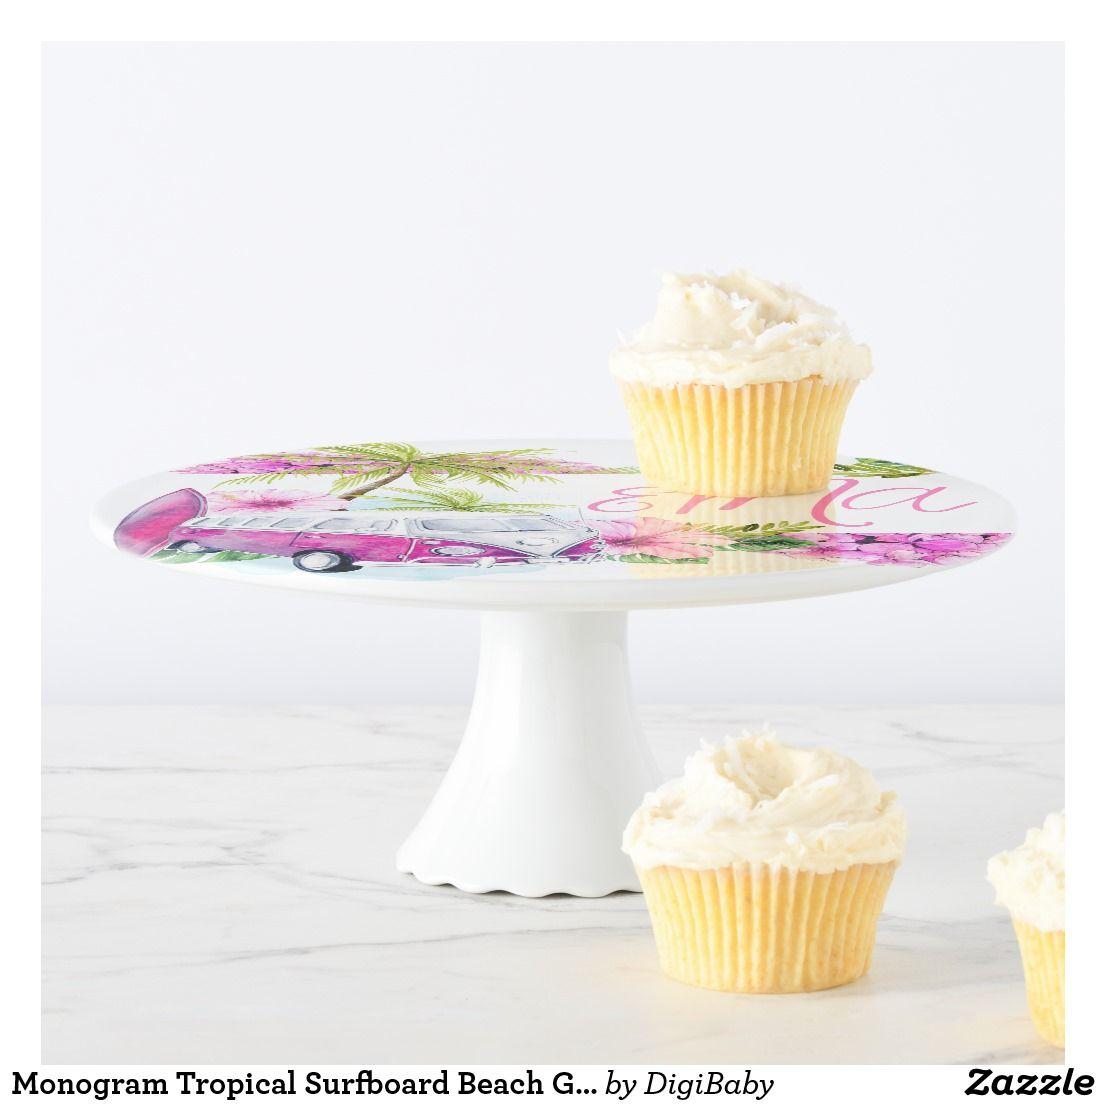 Monogram tropical surfboard beach girl cake stand cupcakestand